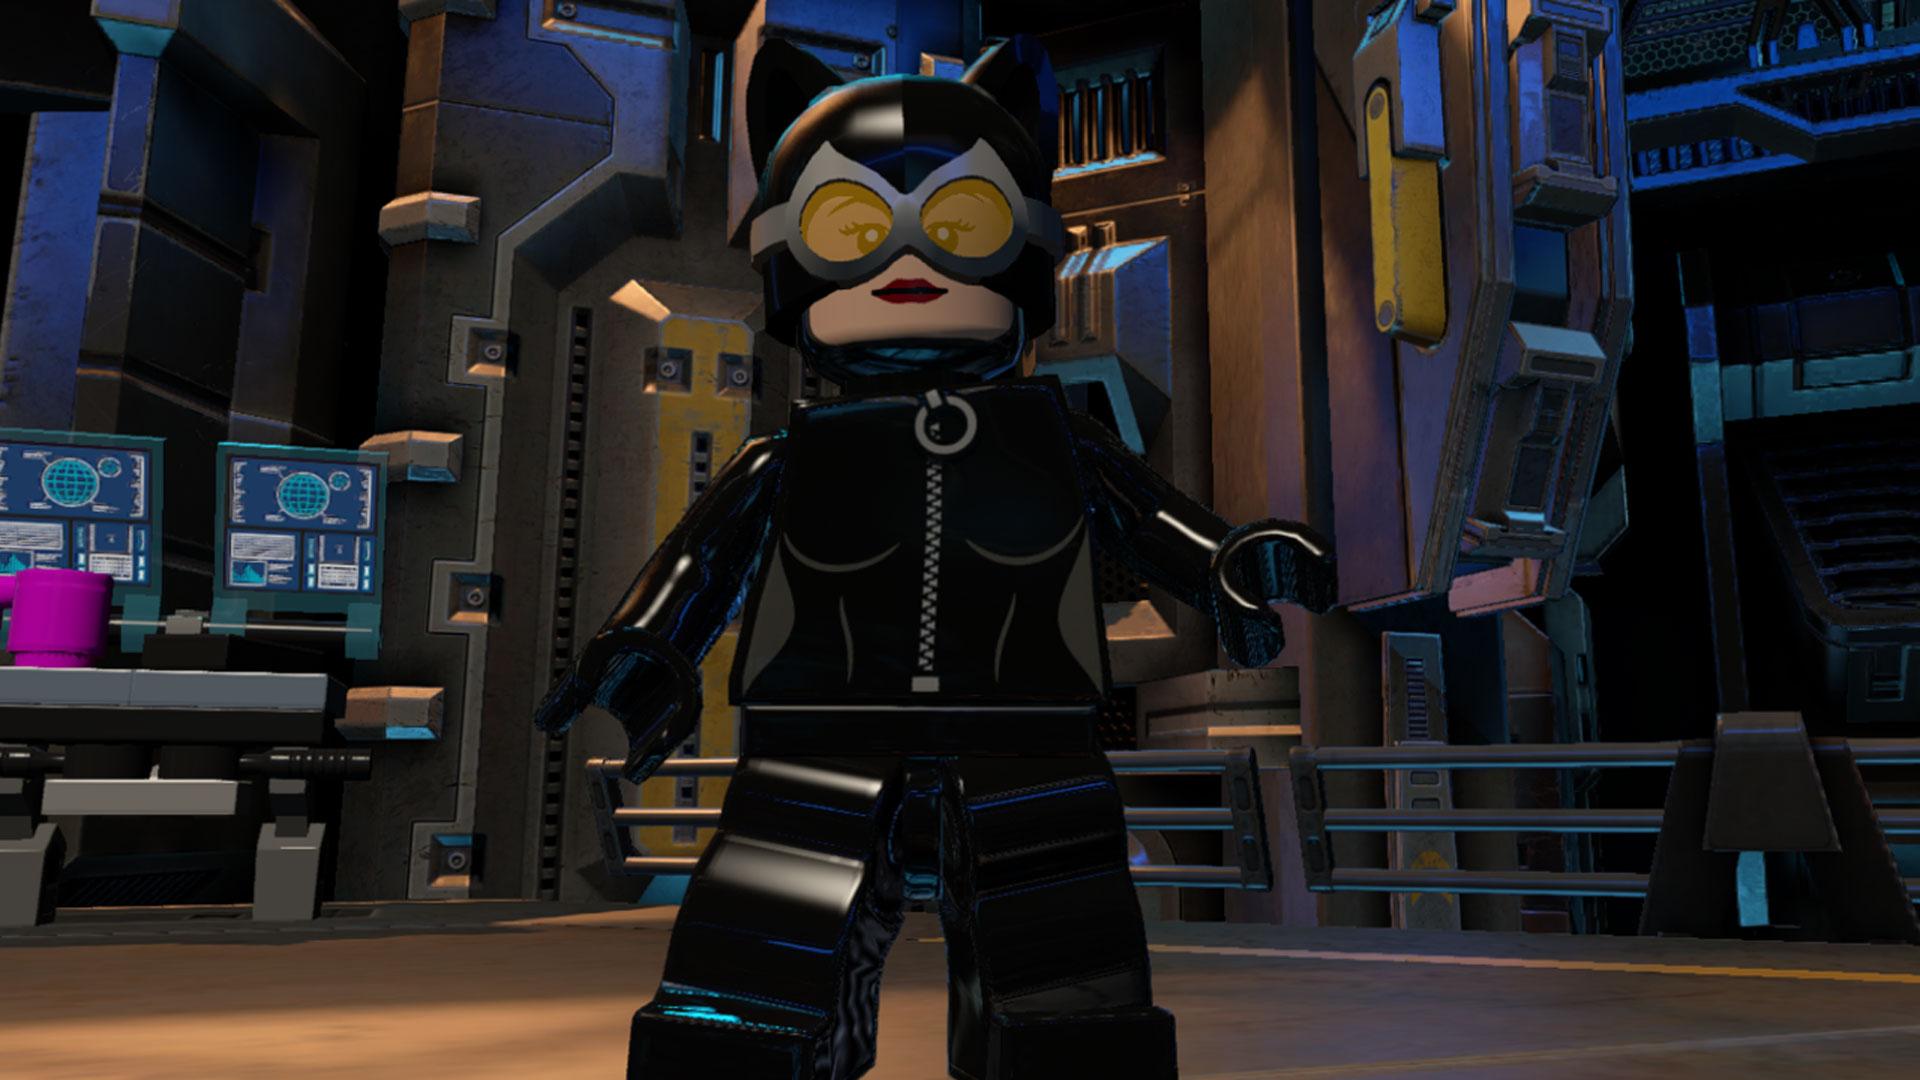 Koop LEGO Batman 3: Beyond Gotham PC spel | Steam Download